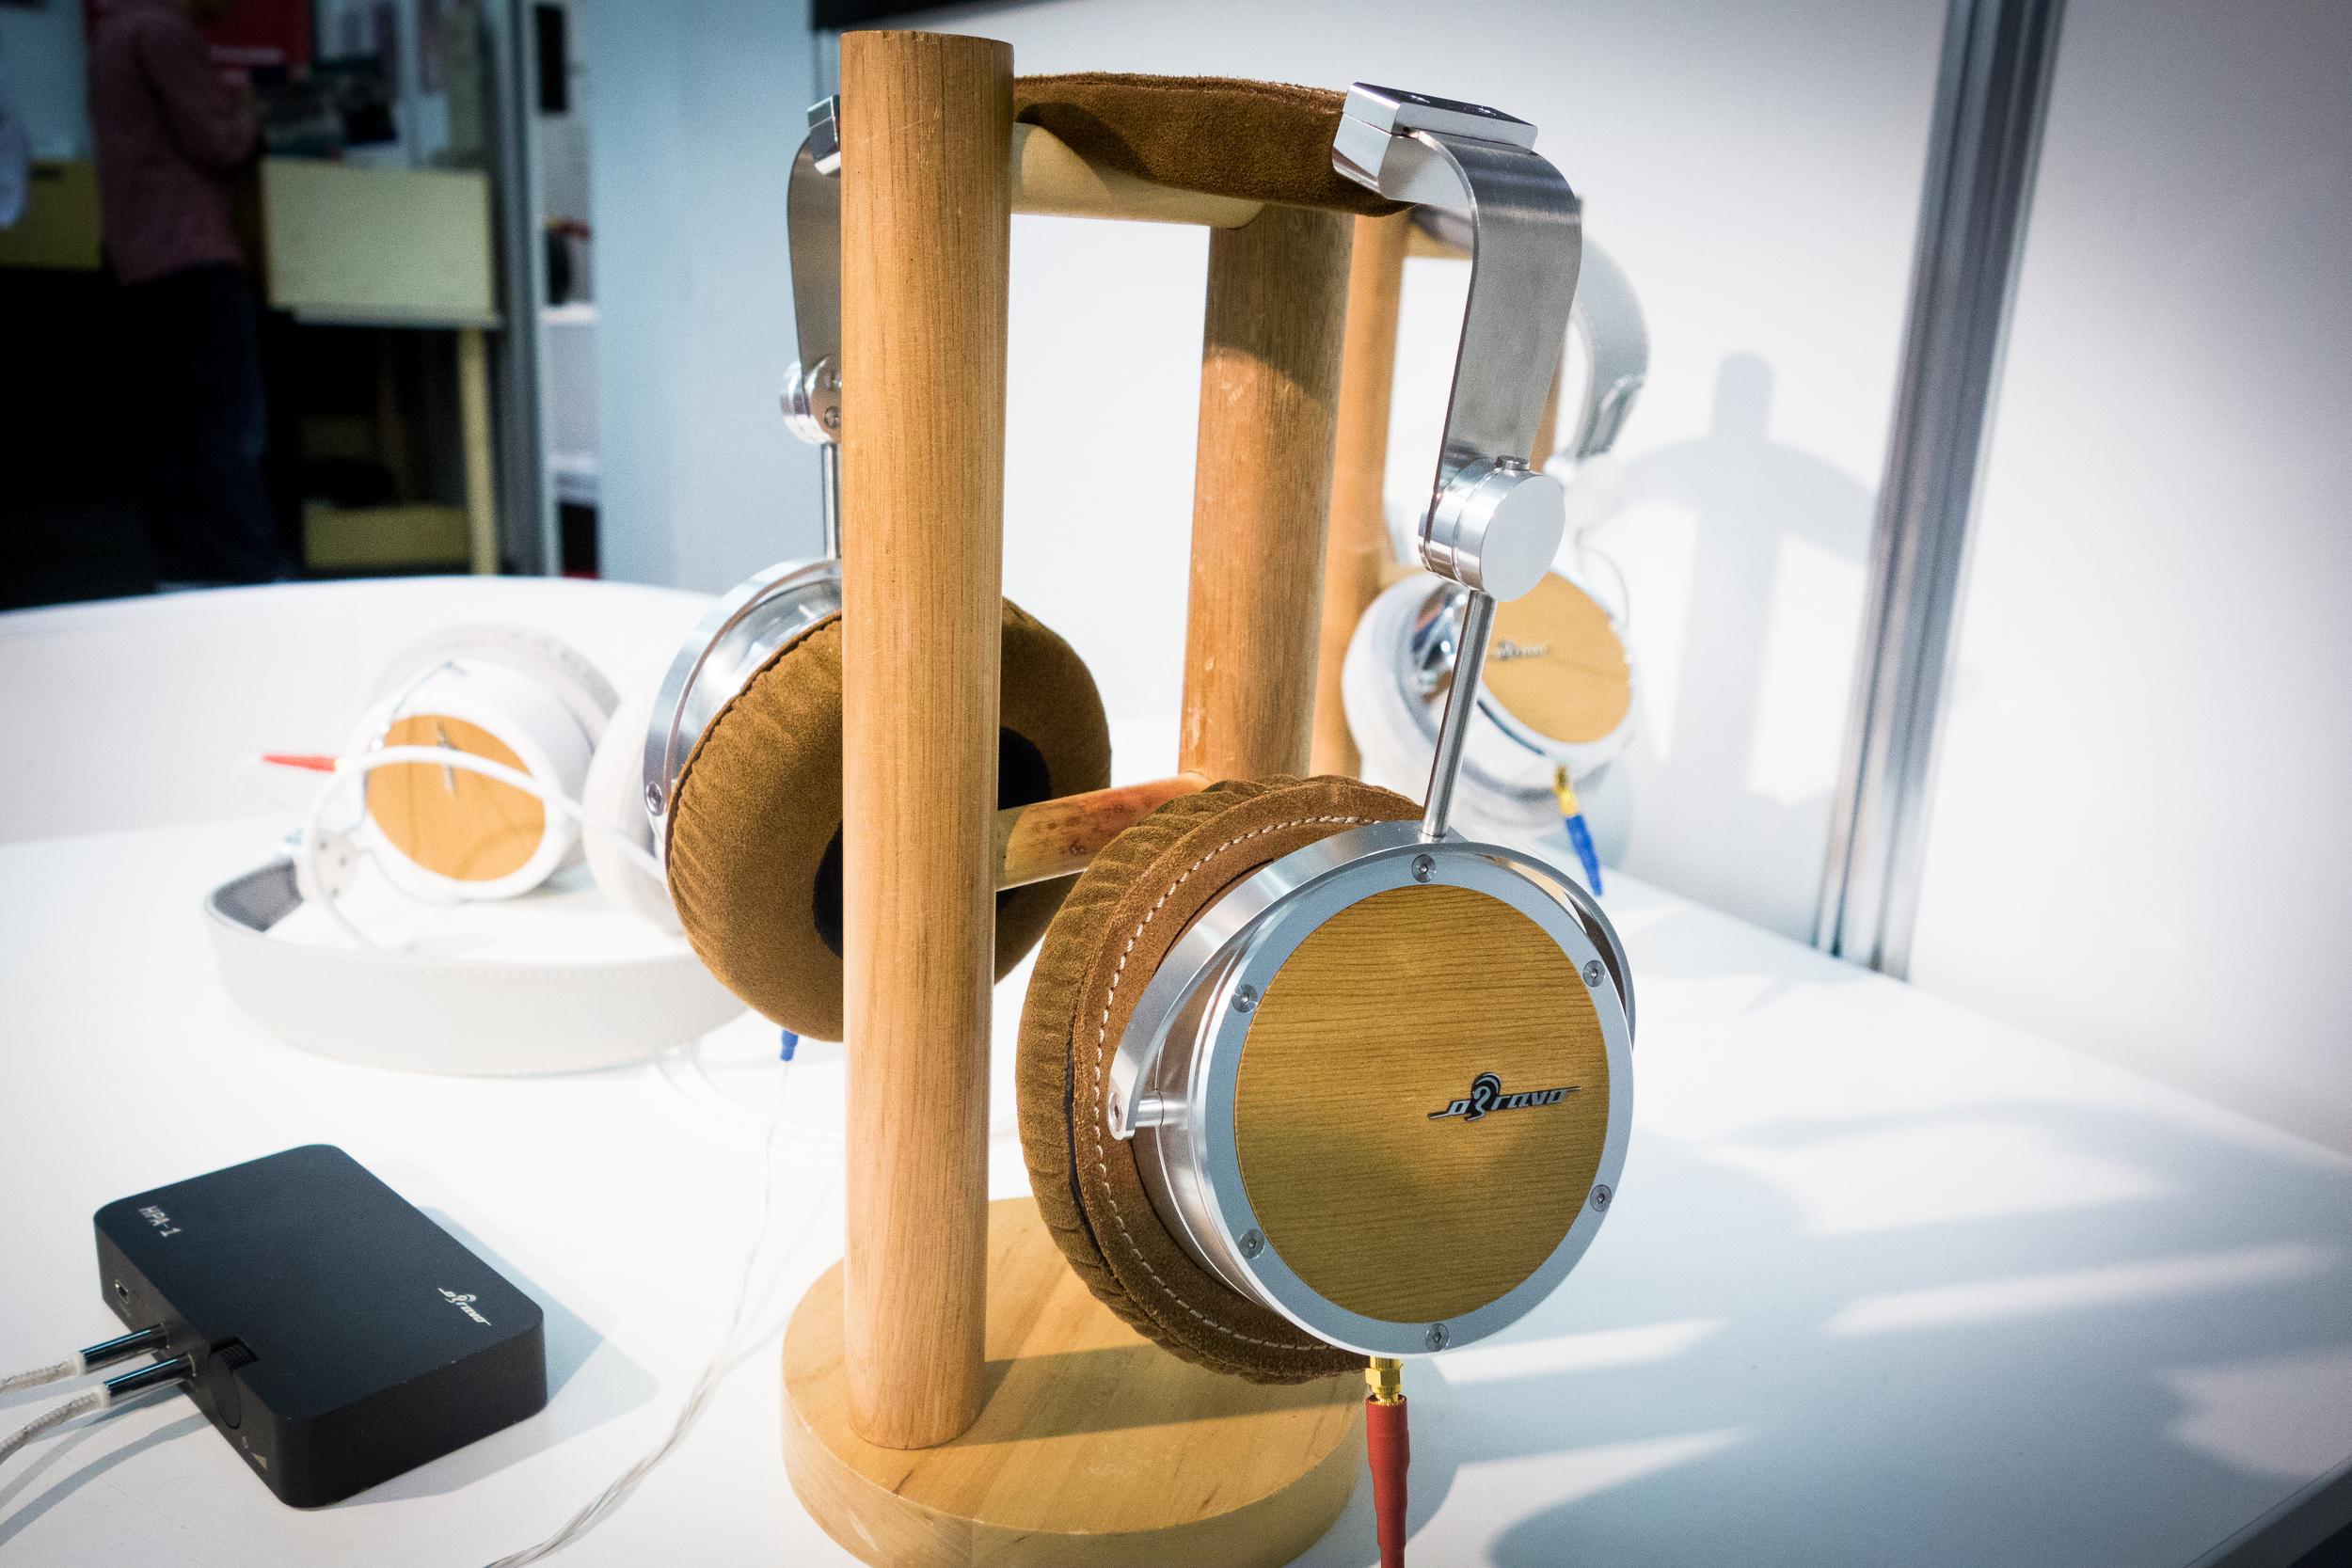 Obravo HAMT-1 headphones and amplifier